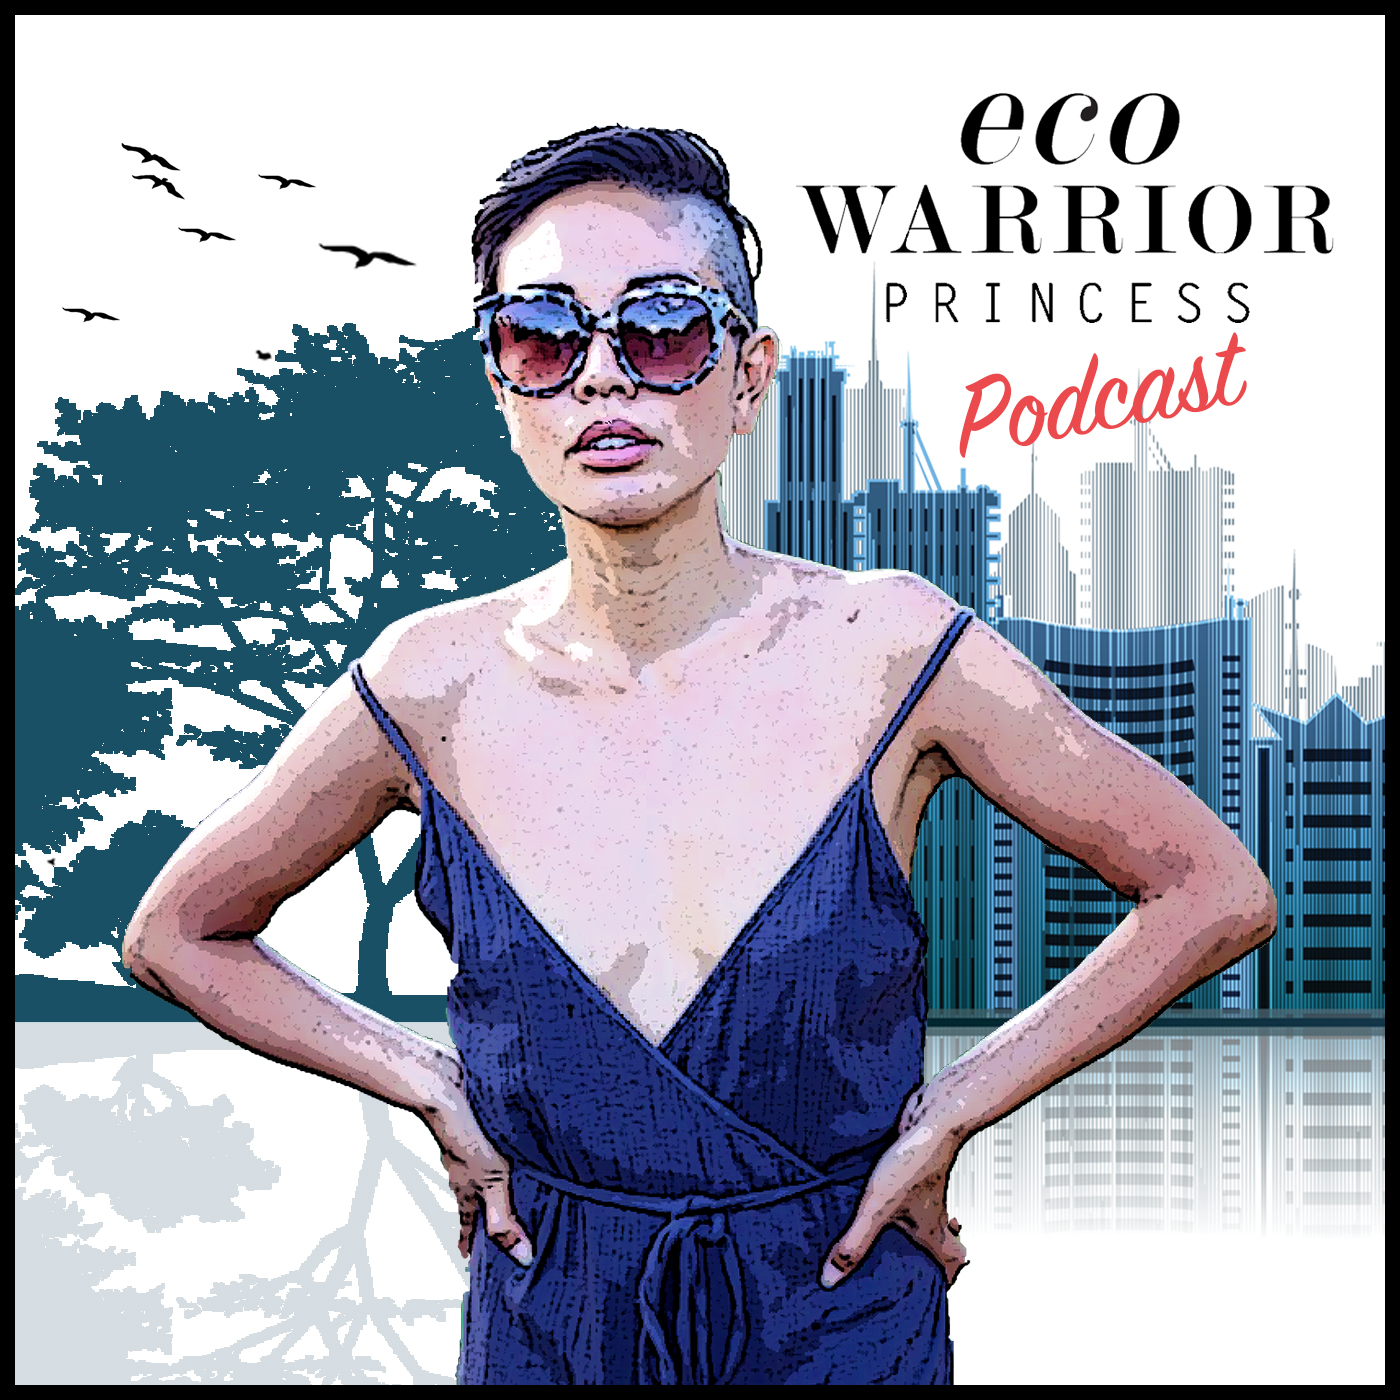 Introducing the Eco Warrior Princess Podcast show art